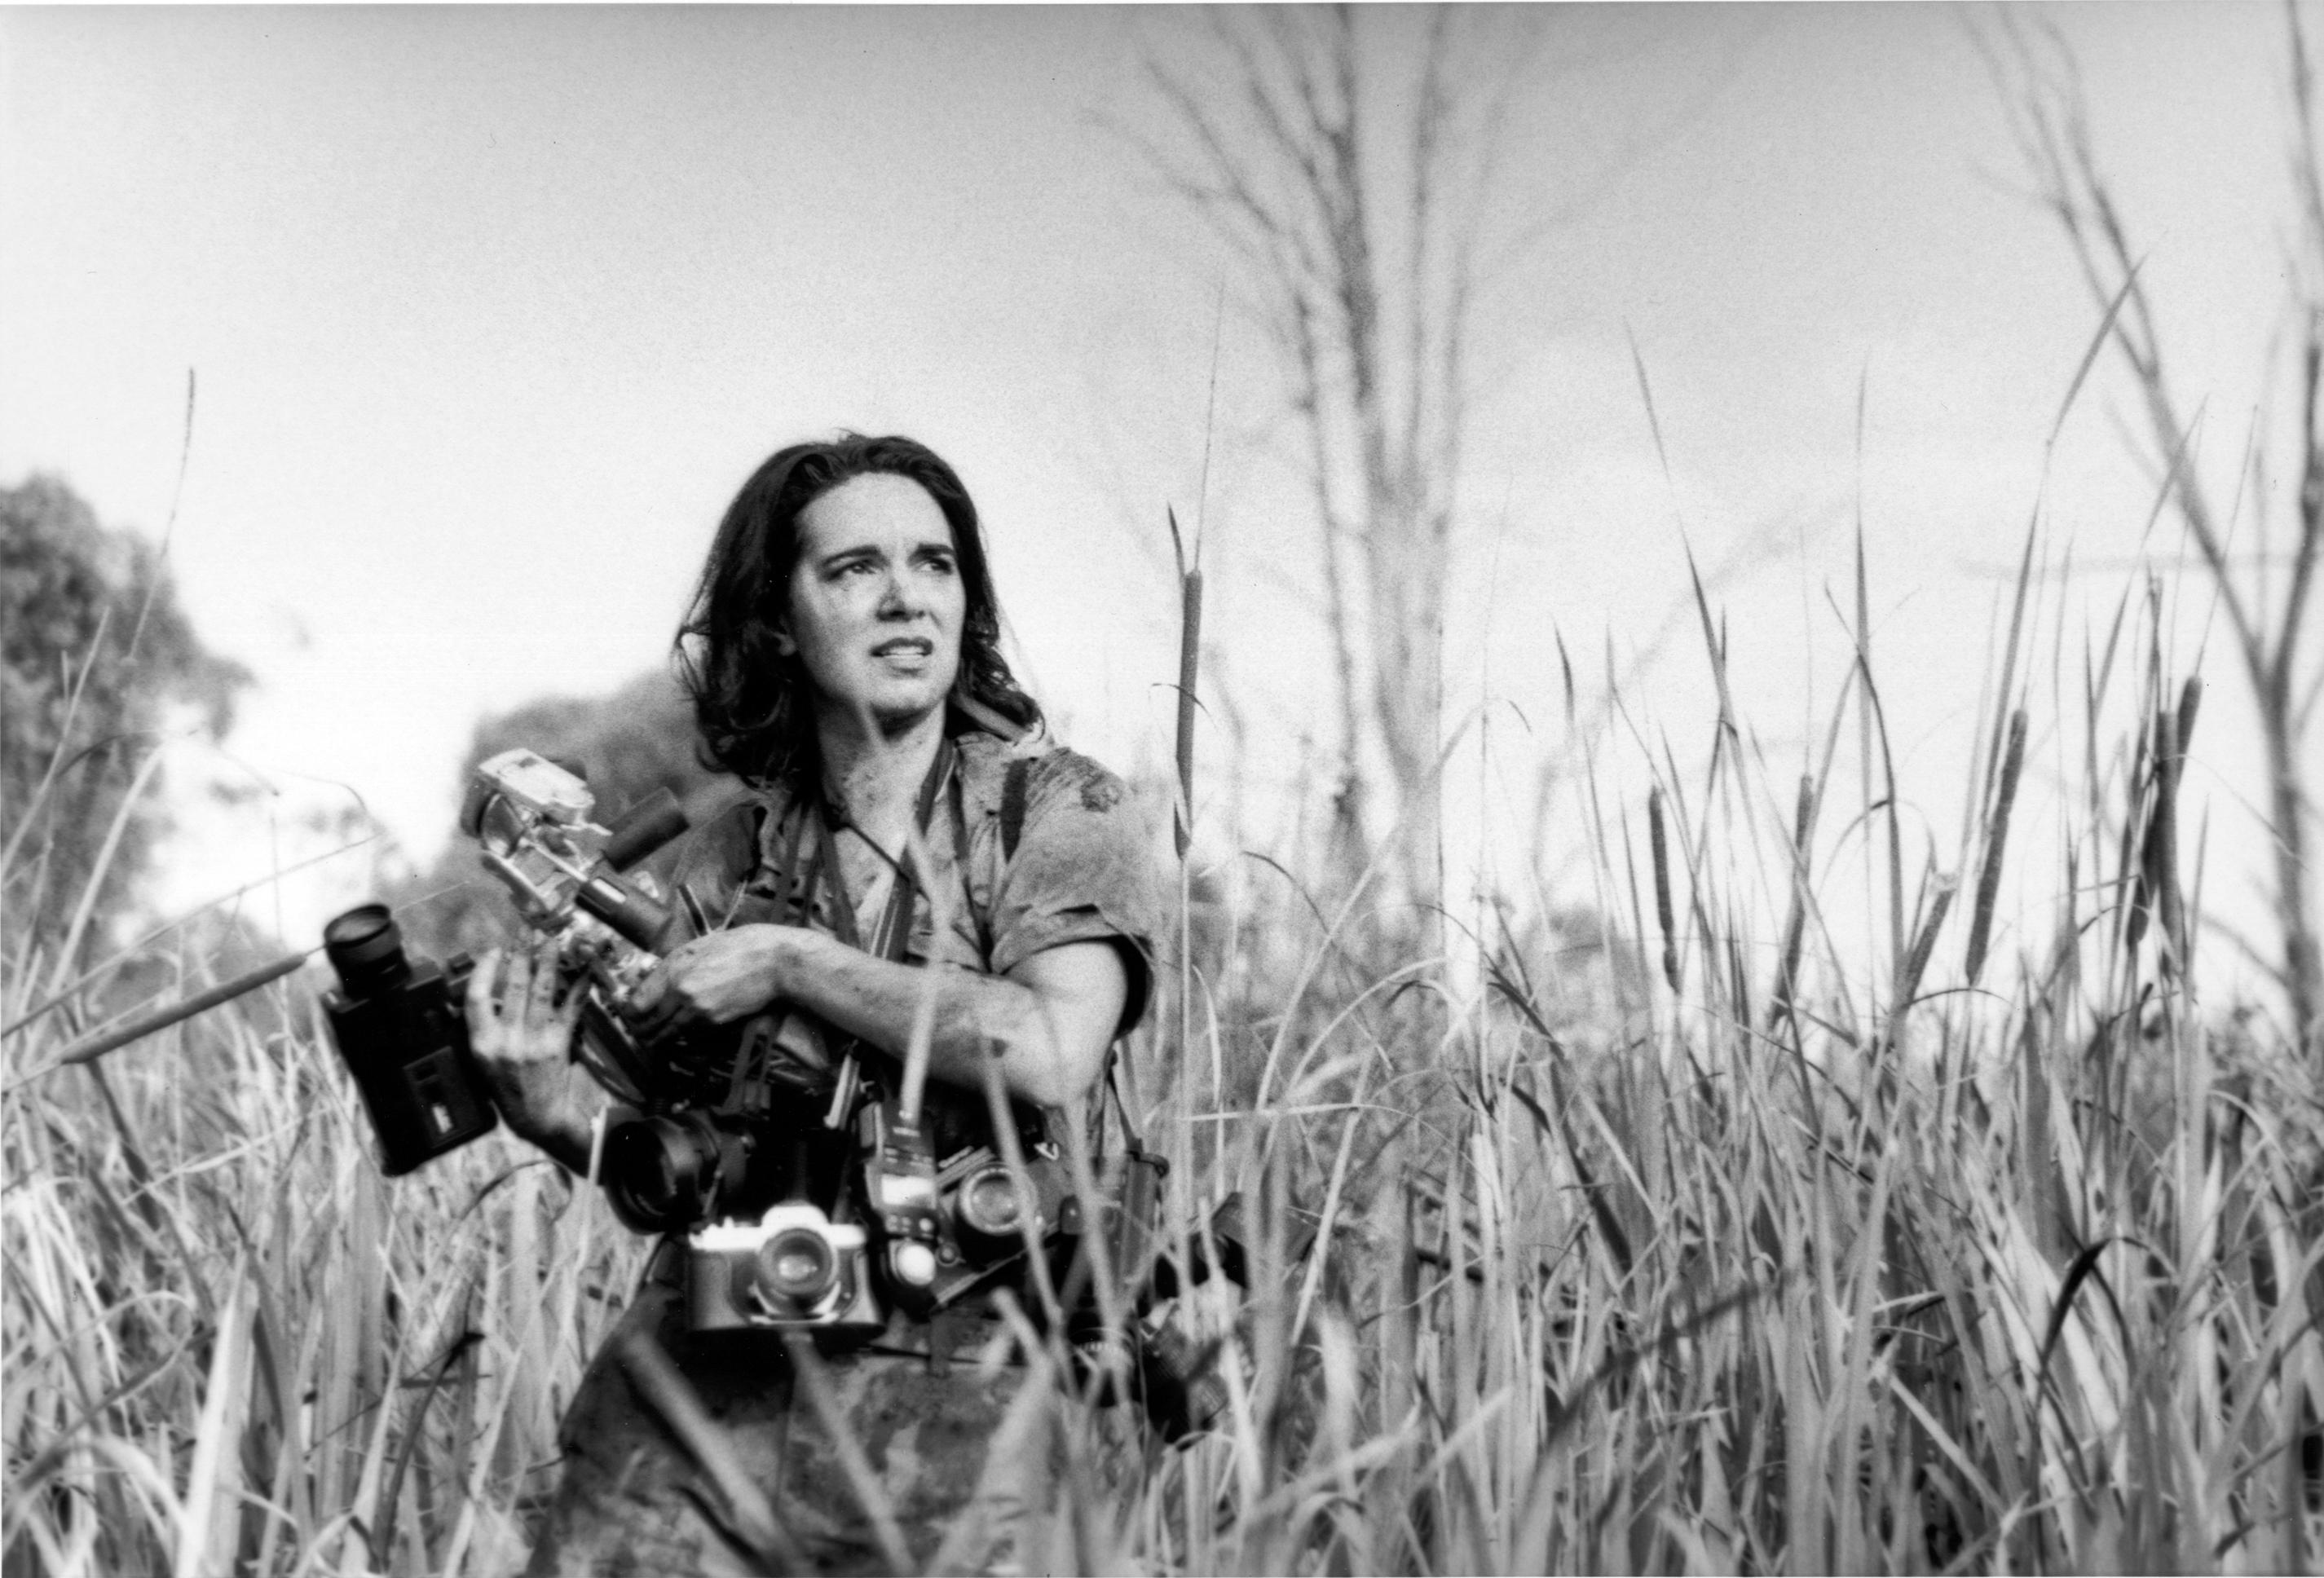 tracey moffatt Tracey moffatt, director: night cries: a rural tragedy tracey moffatt was born on november 12, 1960 in brisbane, australia she is a director and writer, known for night cries: a rural tragedy (1990), bedevil (1993) and moodeitj yorgas (1988.